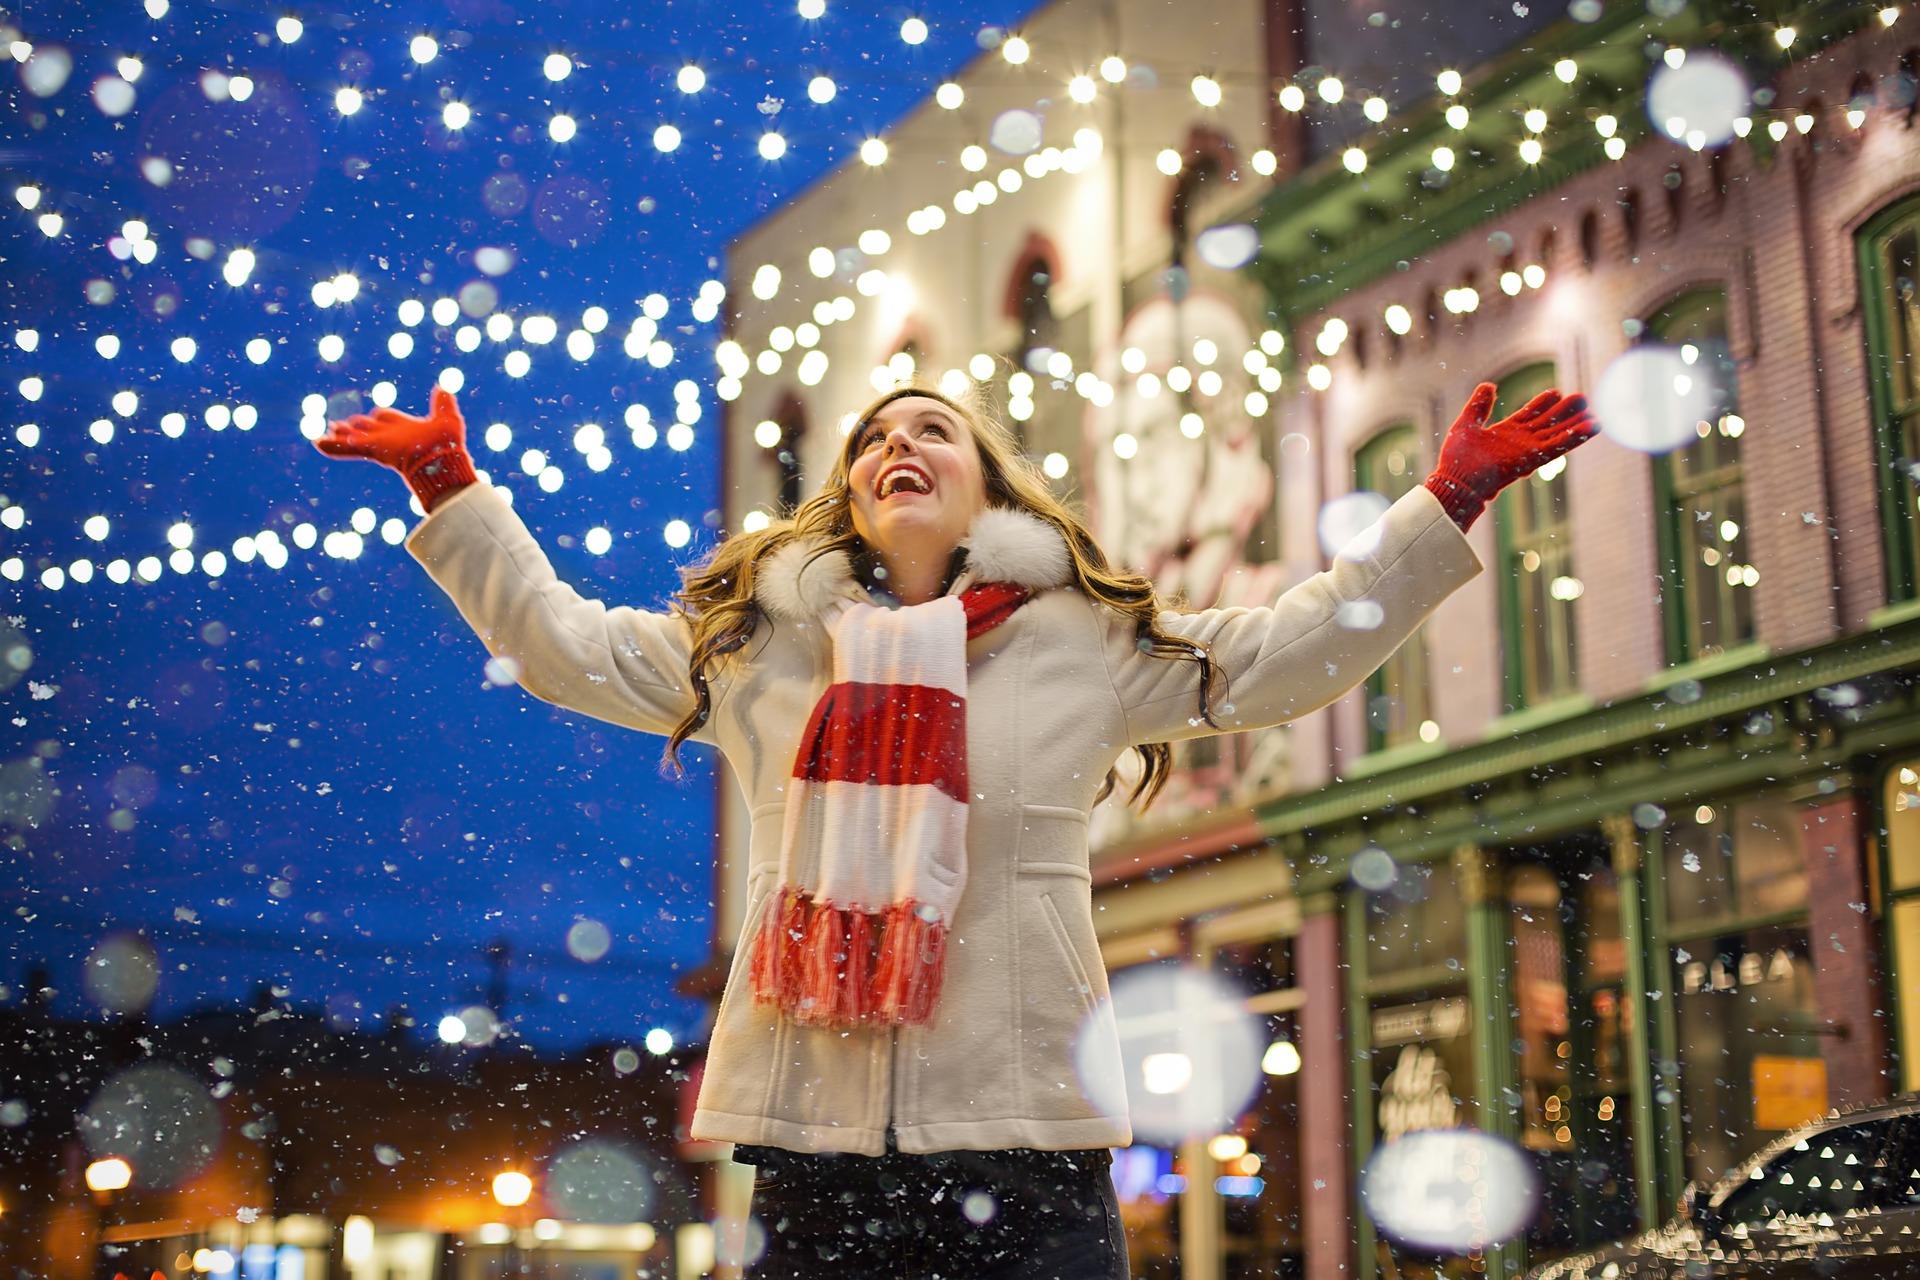 Enchanting Christmas Locations Around the World